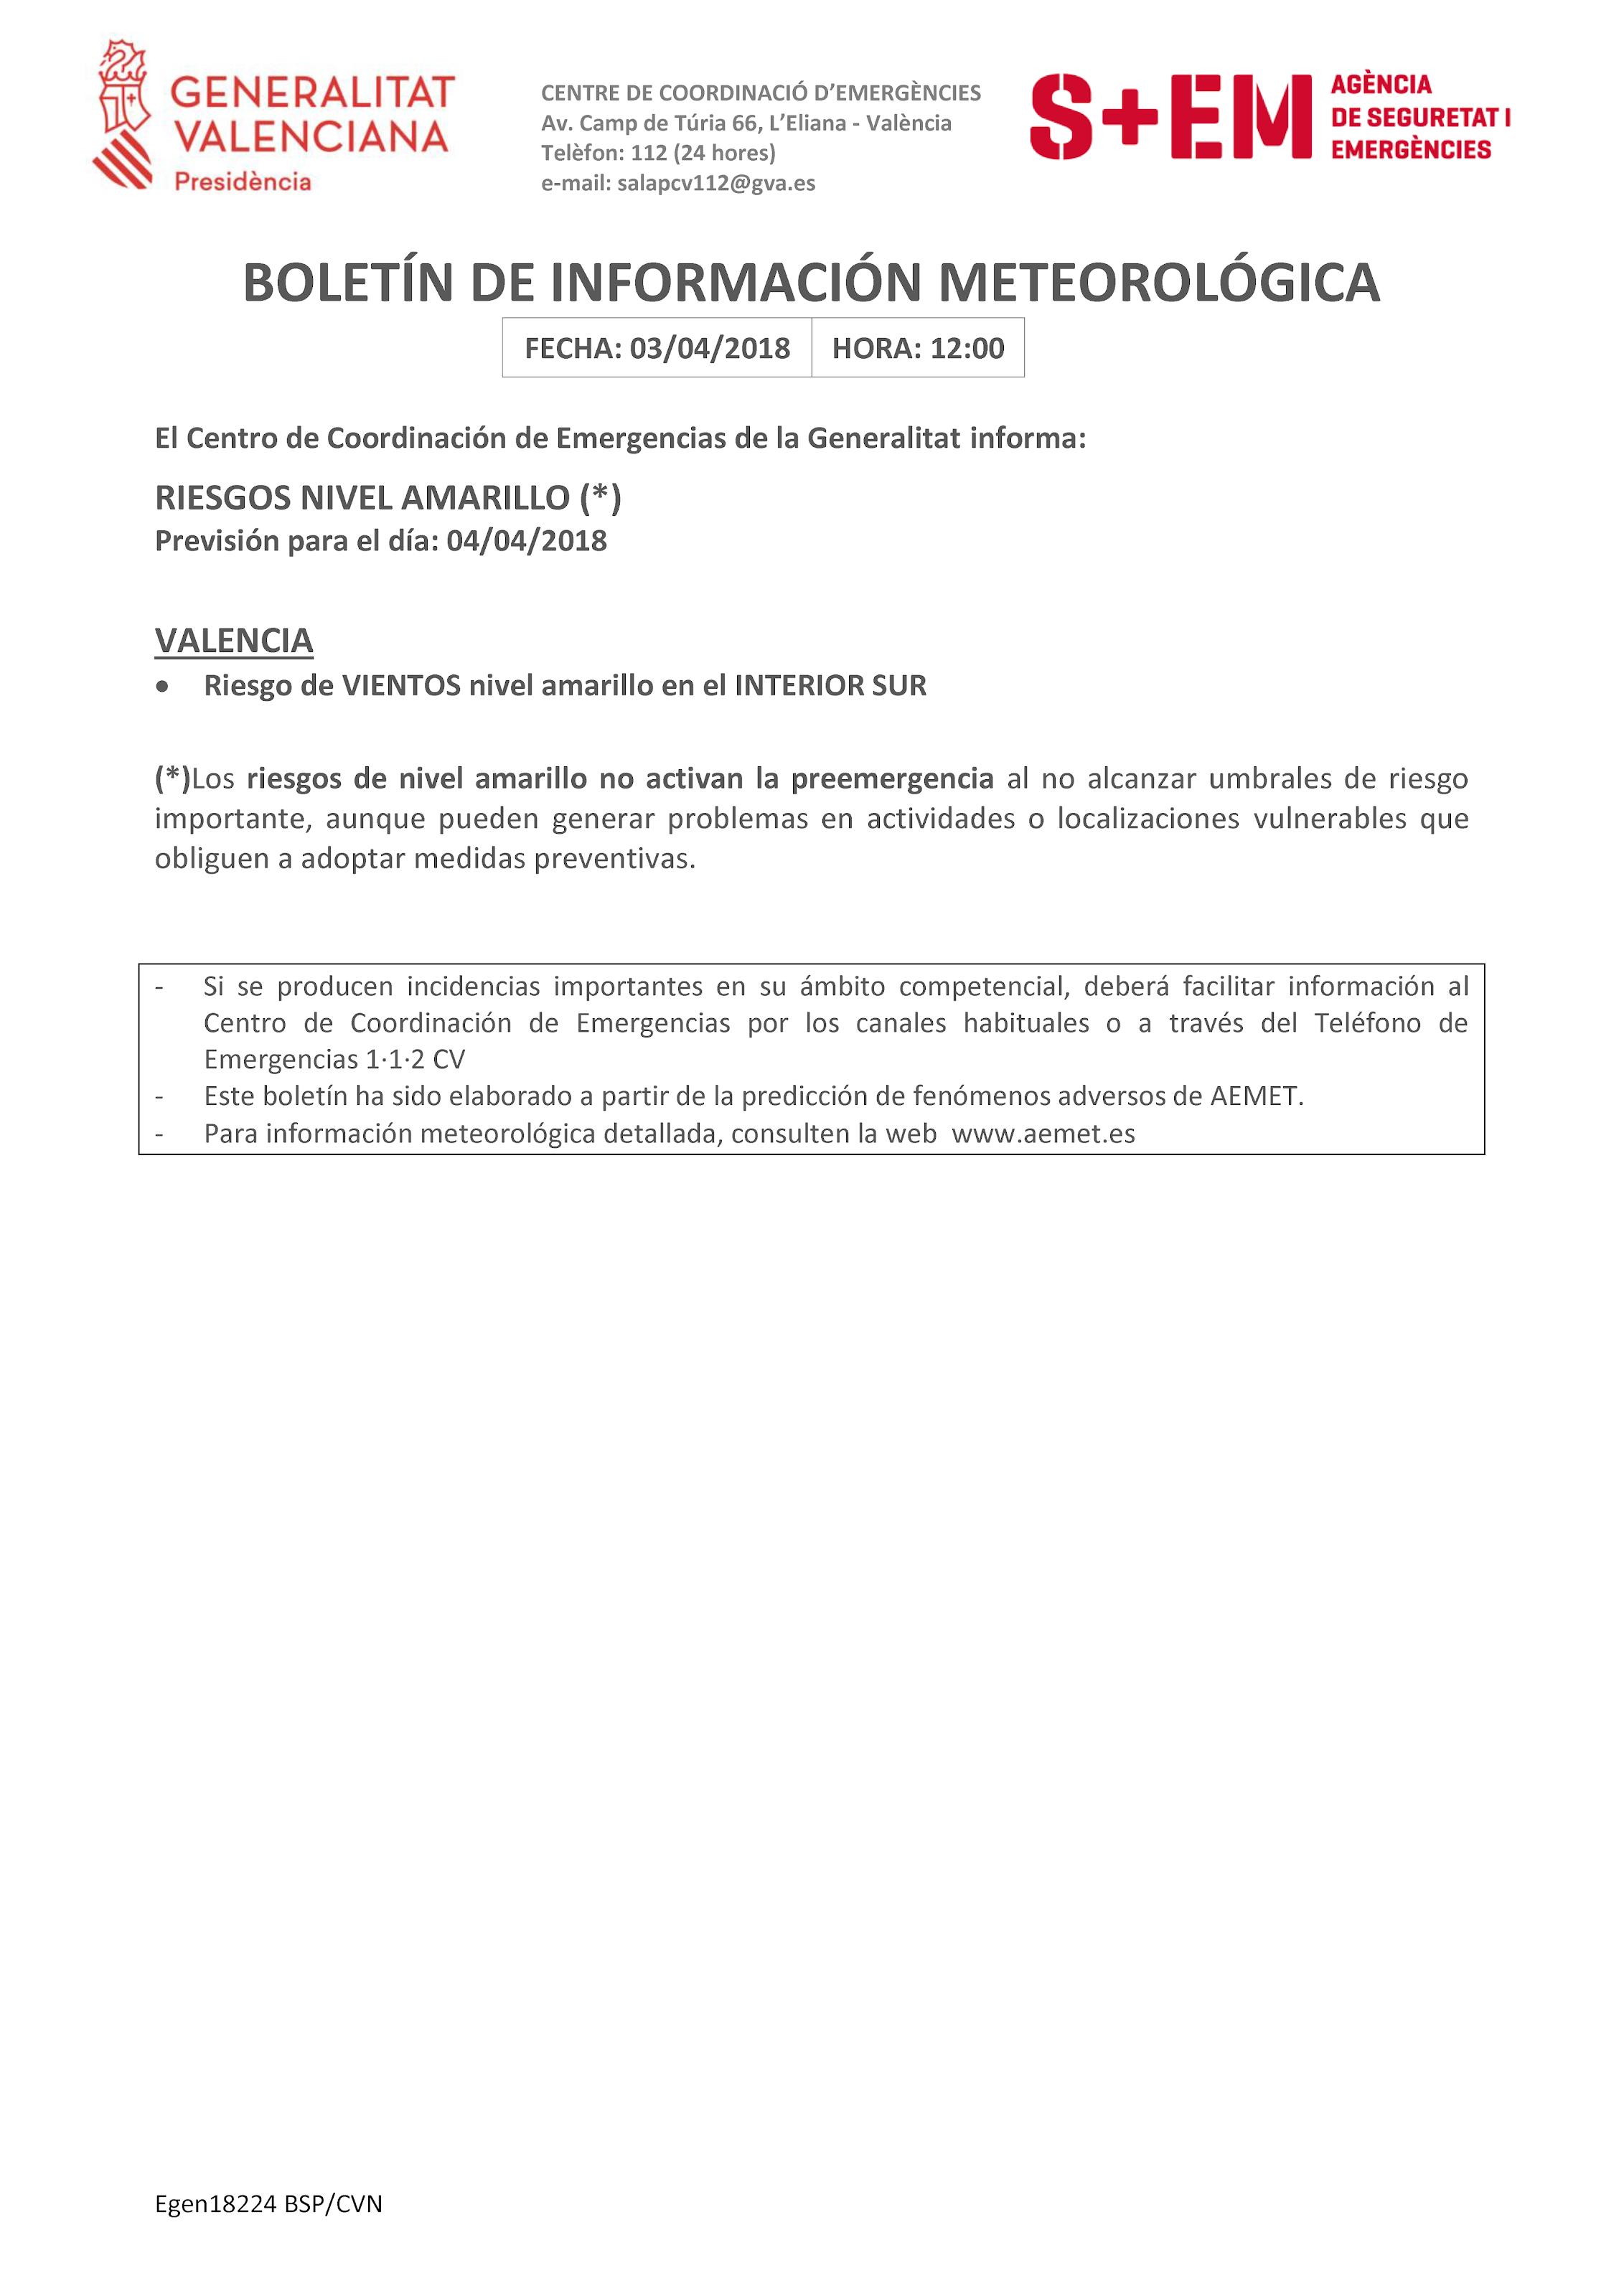 Policía Local de Quesa: BOLETÍN INFORMACIÓN METEOROLÓGICA. Riesgo de ...